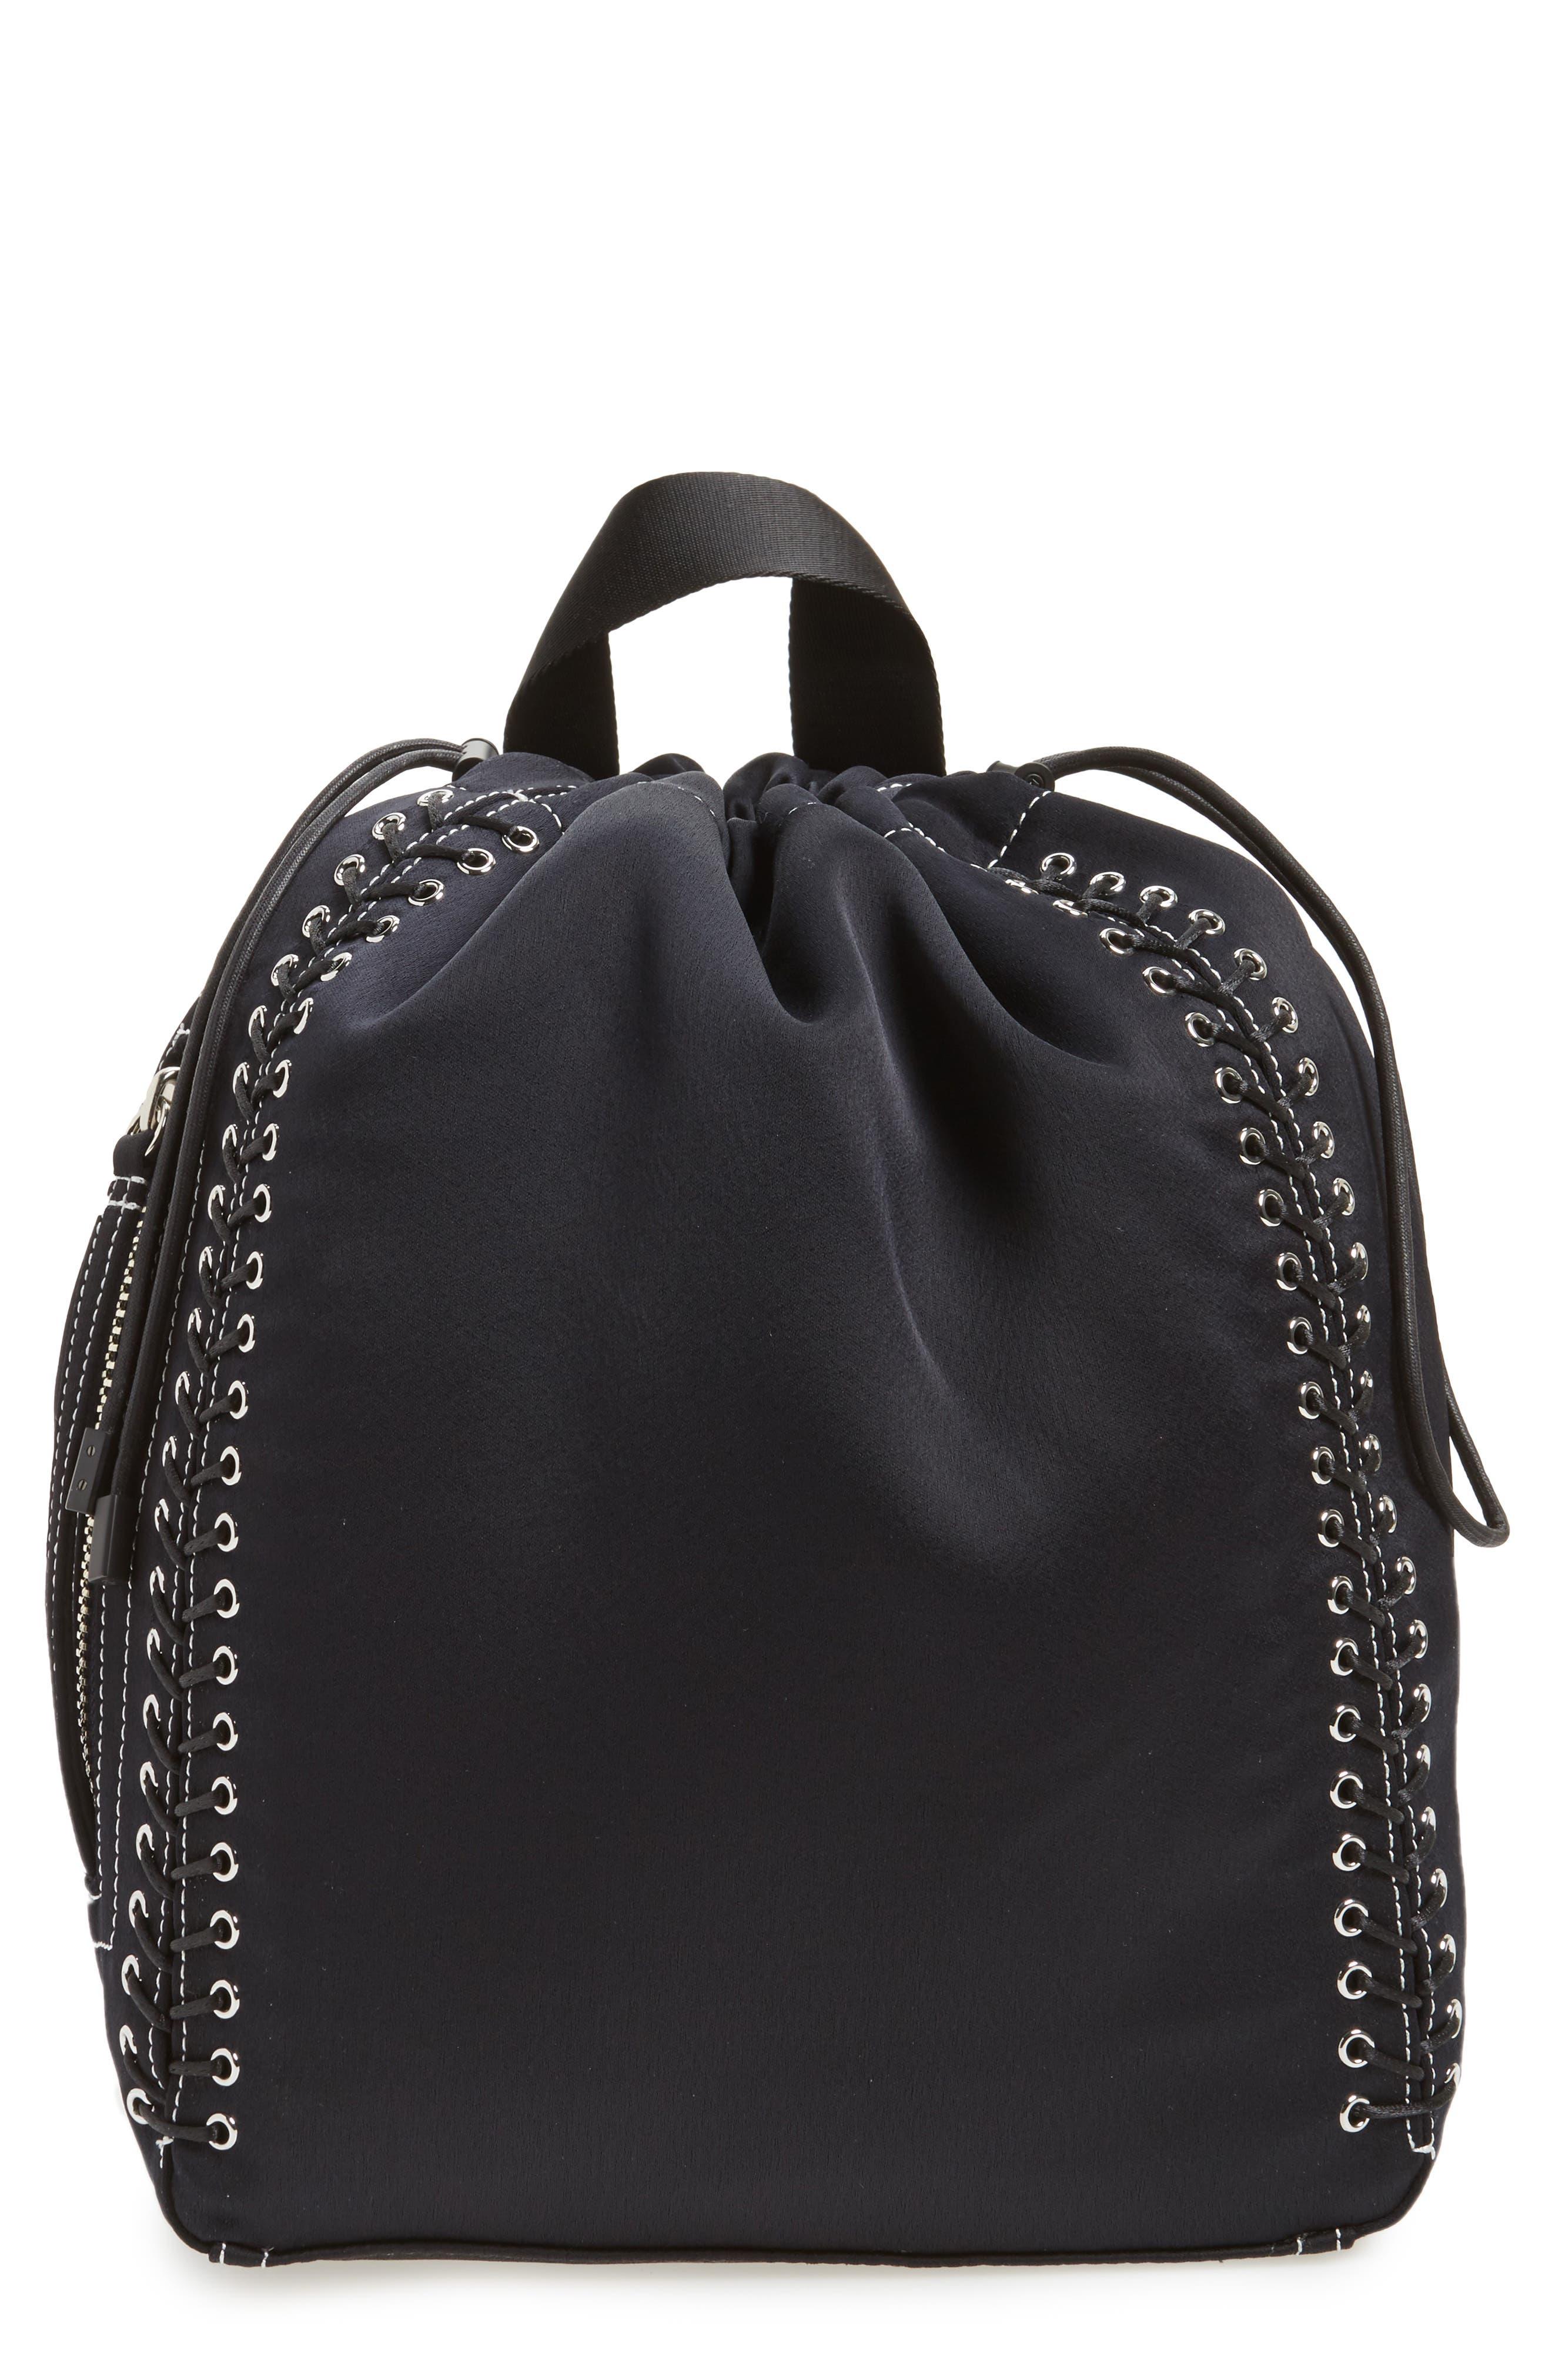 Phillip Lim 3.1 Medium Go-Go Lace-Up Backpack